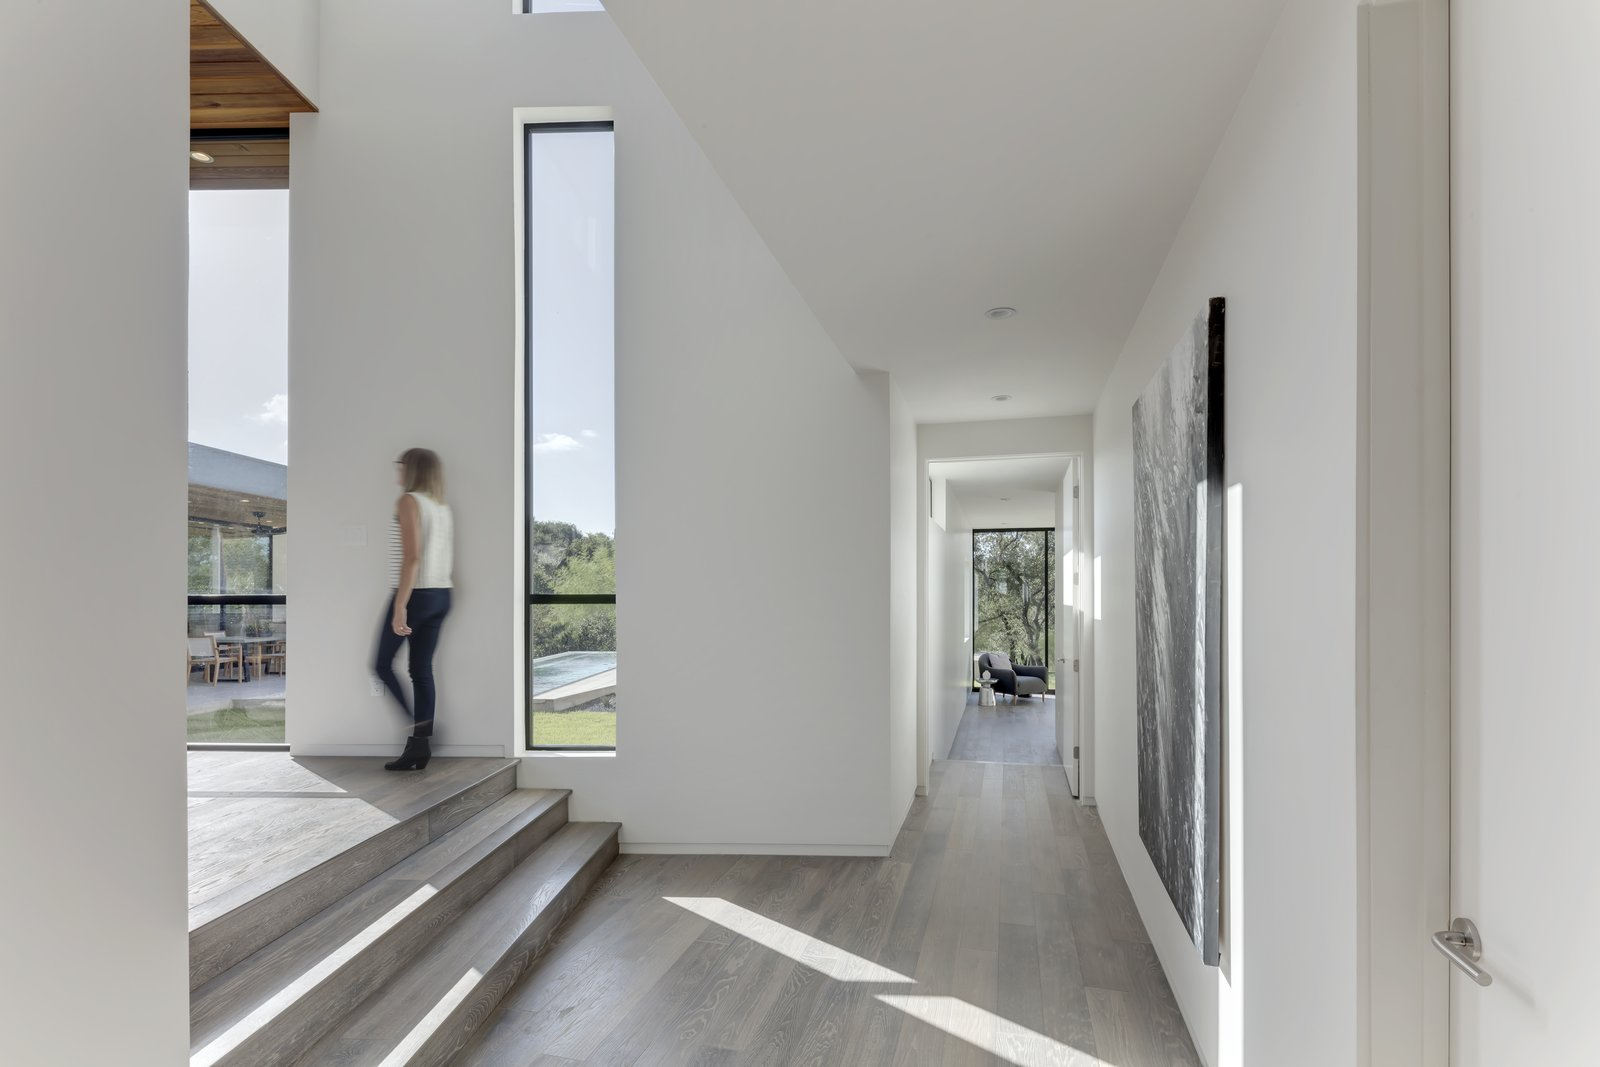 [Bracketed Space] House by Matt Fajkus Architecture